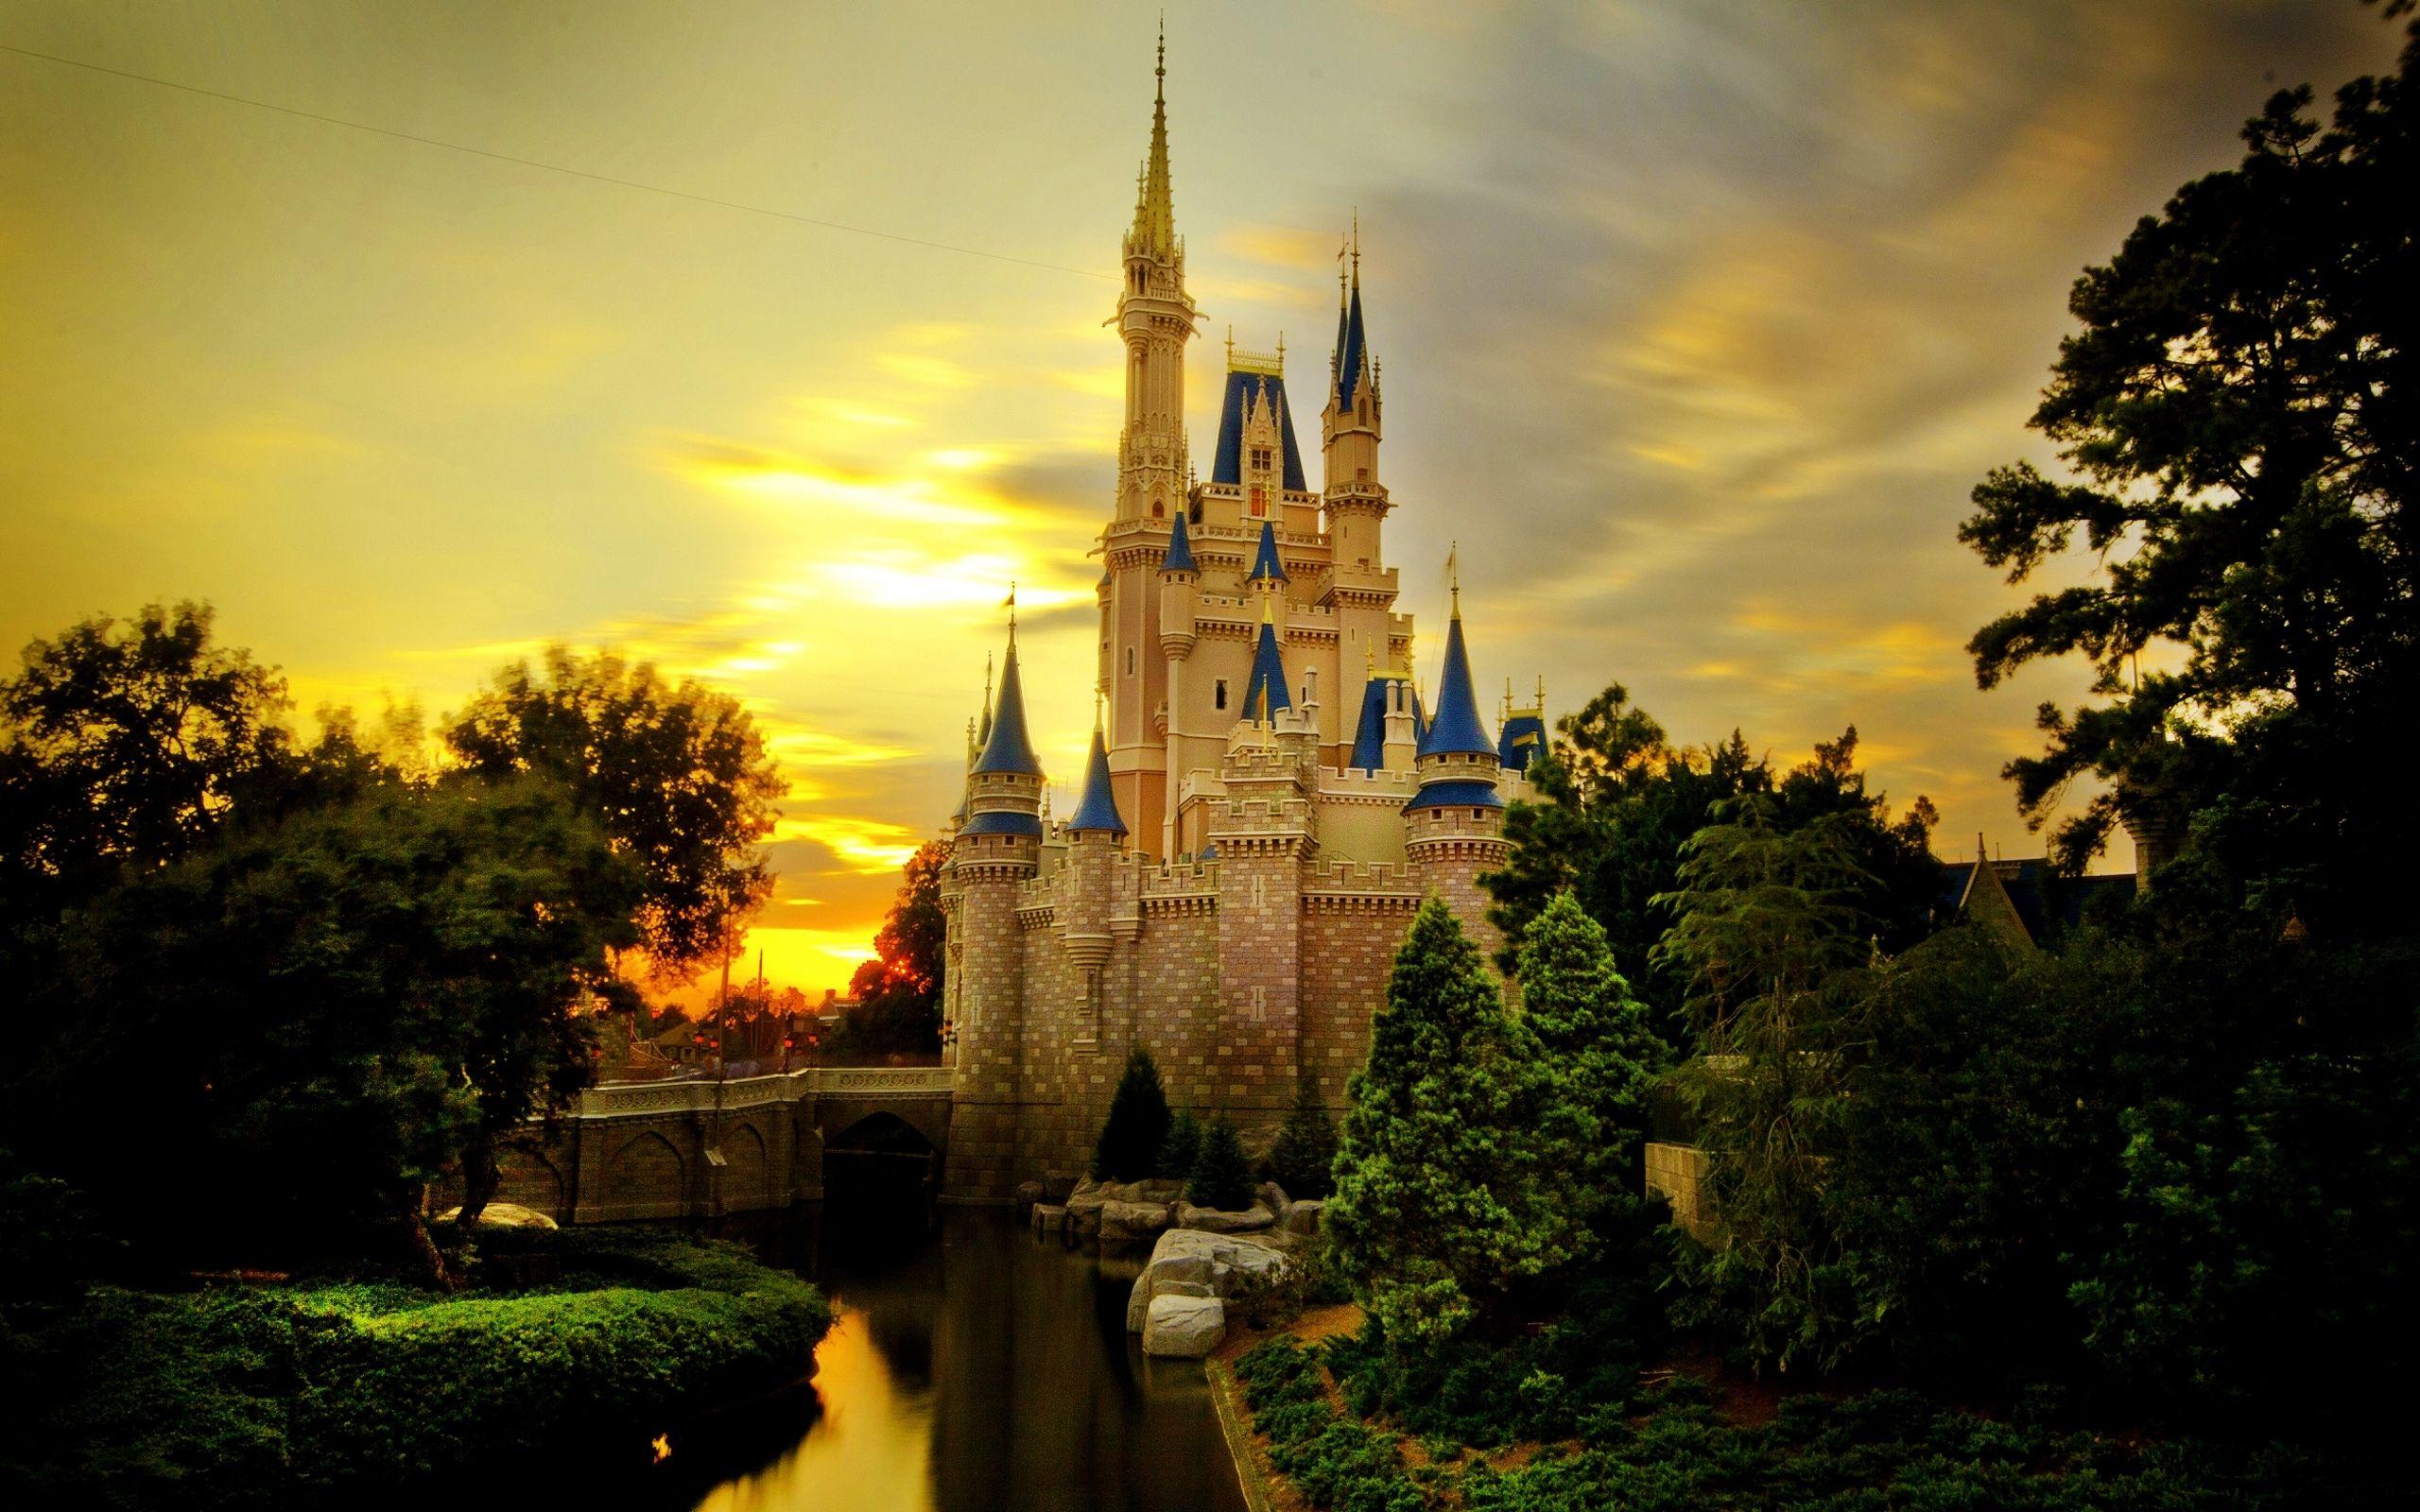 cinderella castle retina macbook pro wallpapers